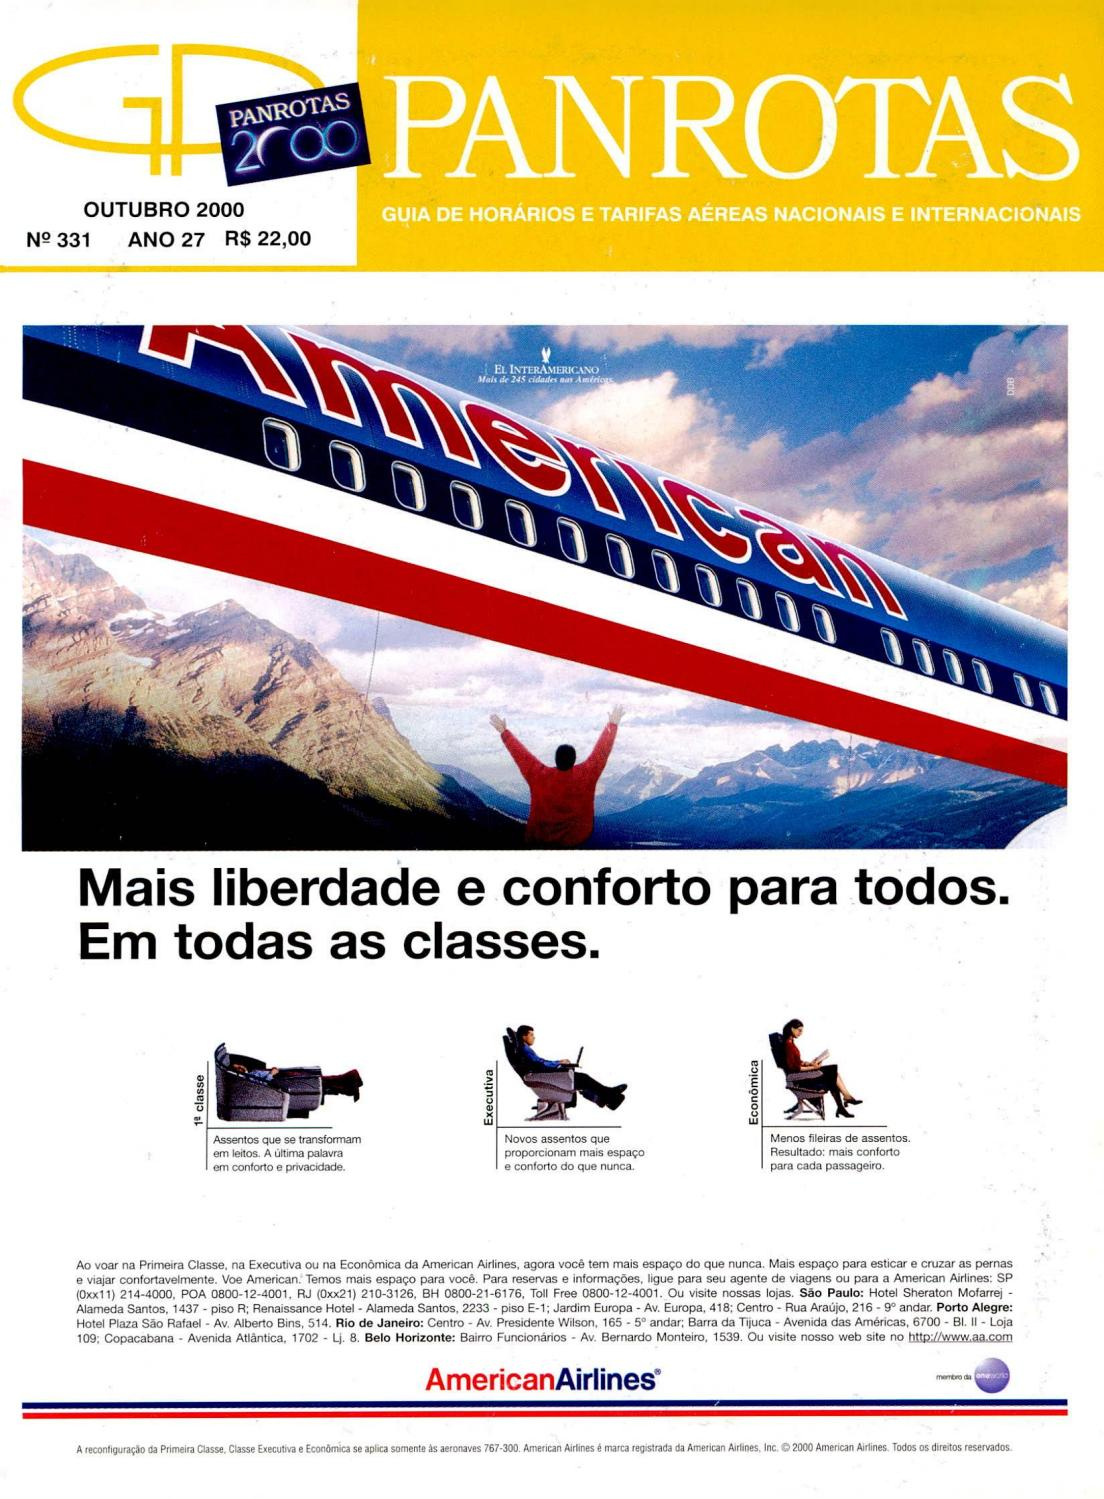 4d63aac7bf7 Guia PANROTAS - Edição 331 - Outubro 2000 by PANROTAS Editora - issuu